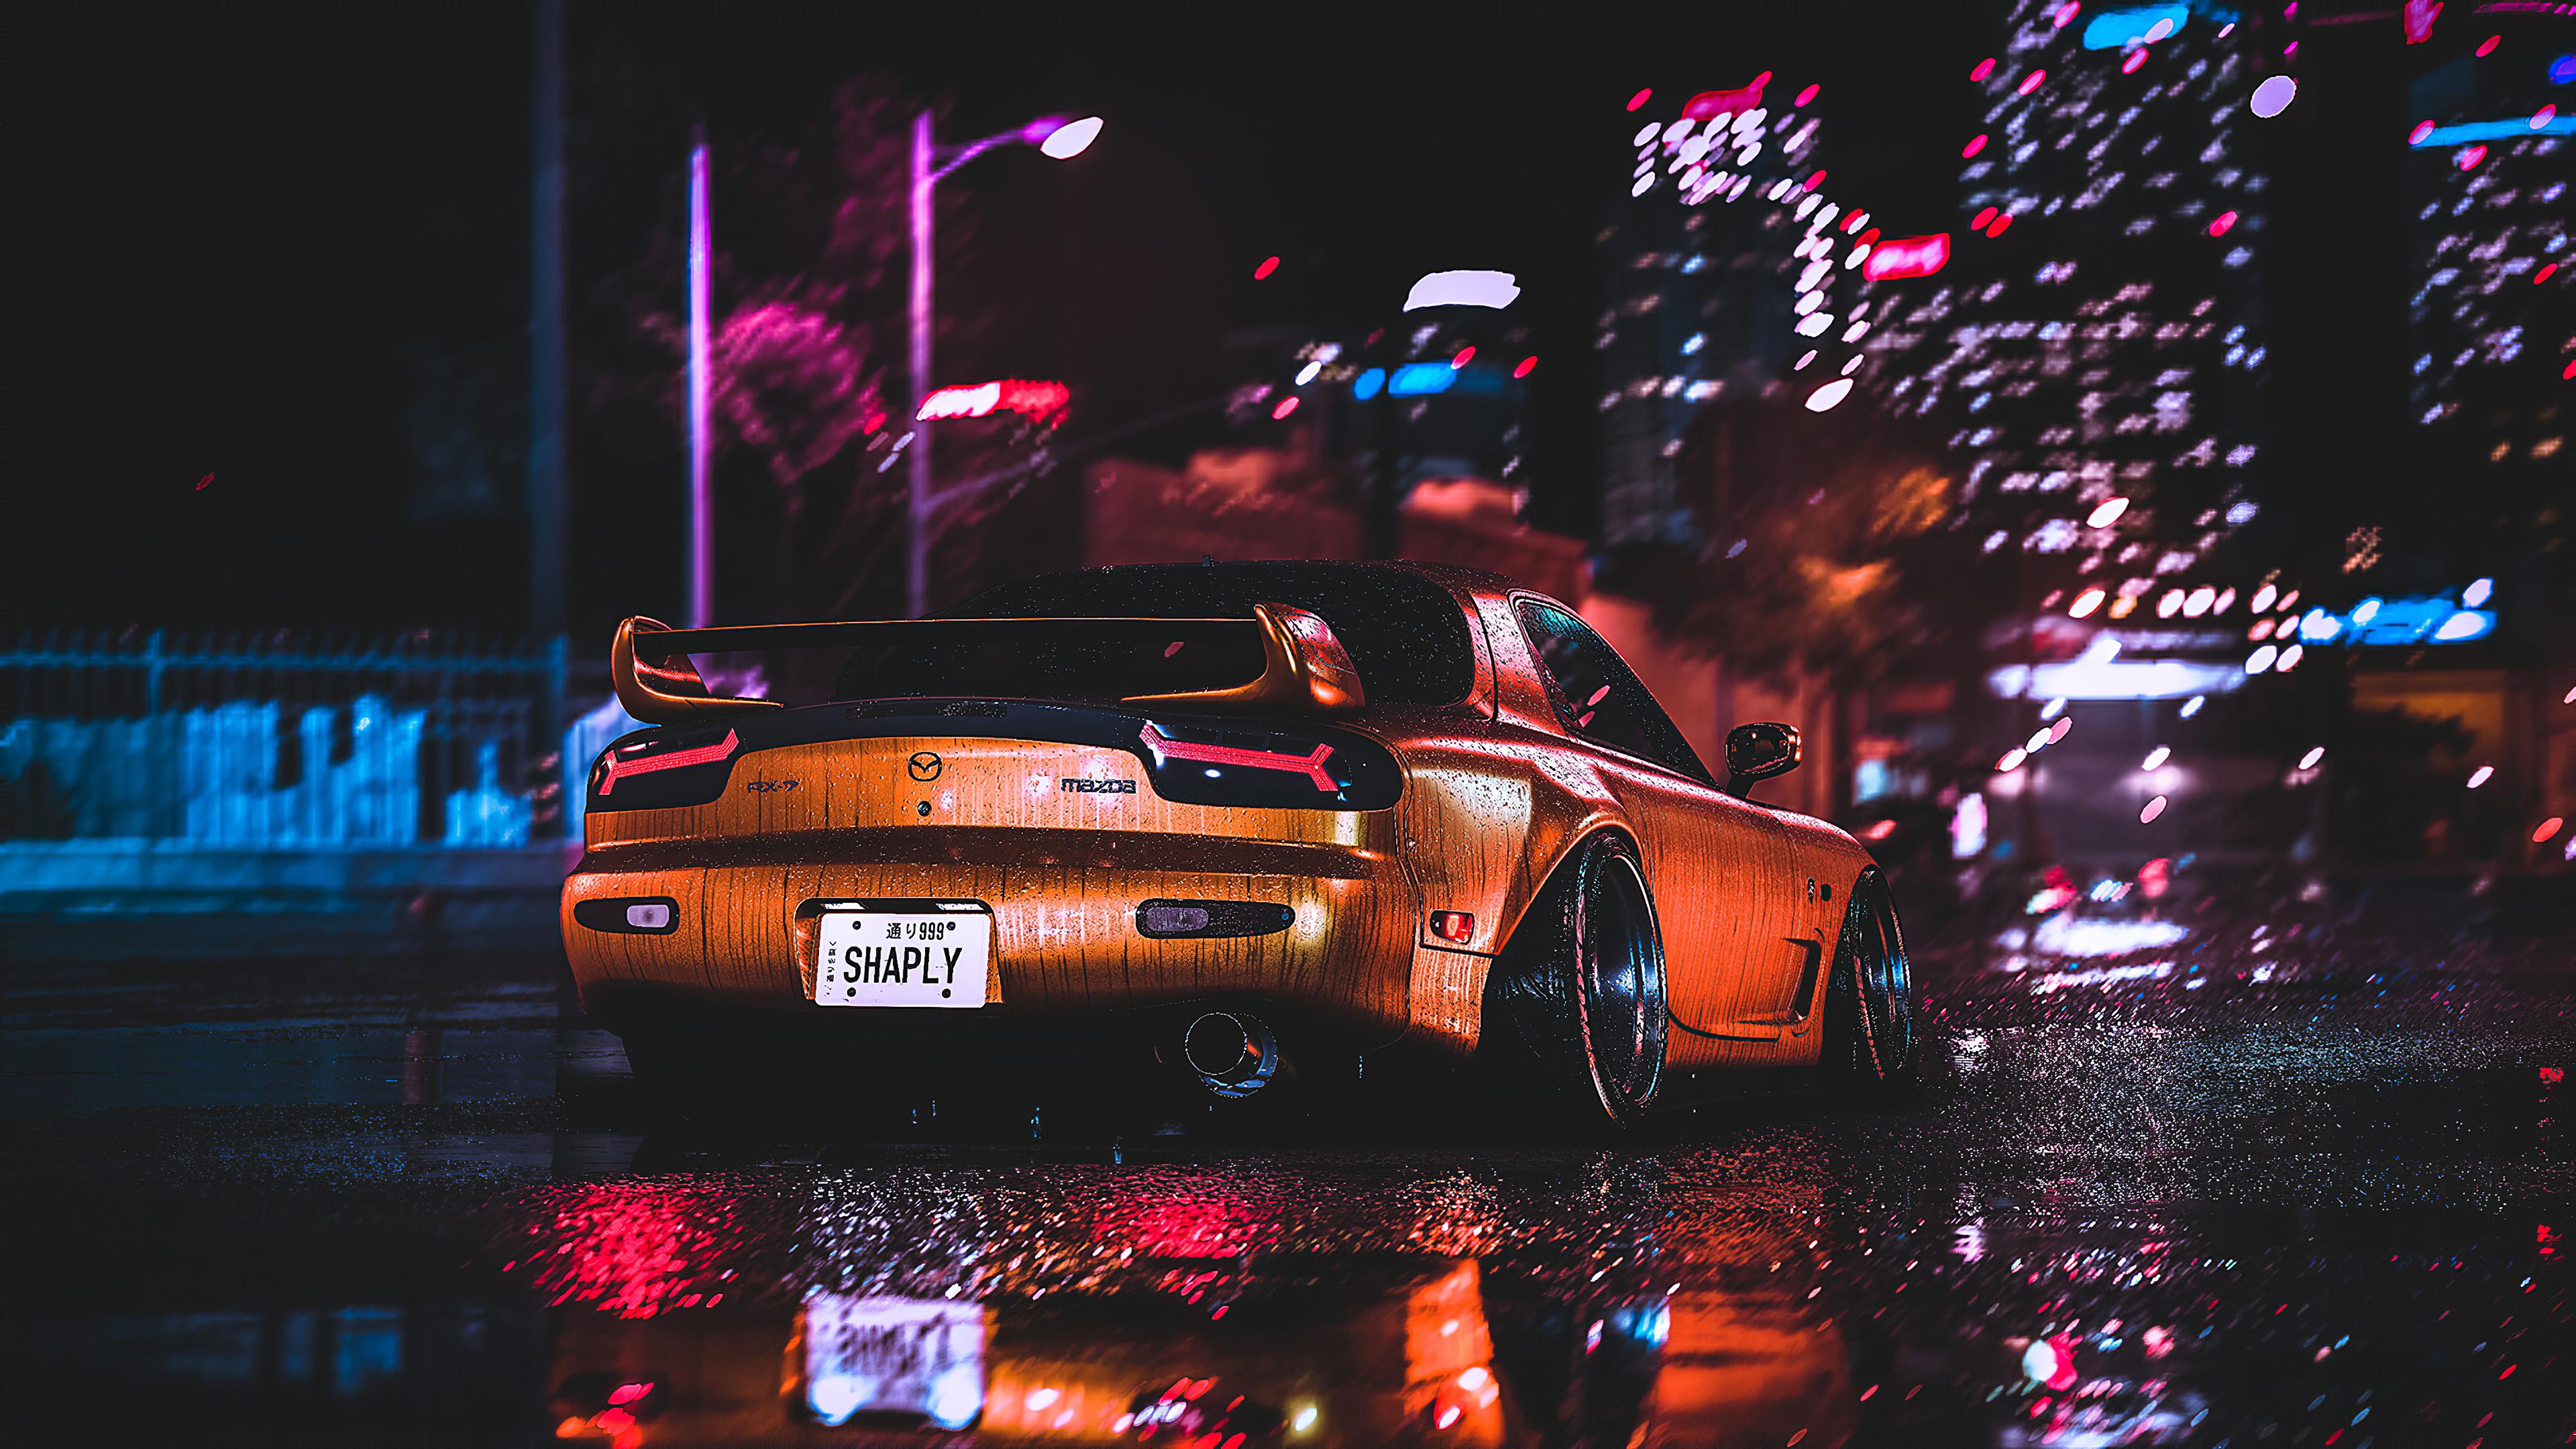 mazda rx7 city night lights 1572660967 - Mazda Rx7 City Night Lights - mazda wallpapers, mazda rx7 wallpapers, hd-wallpapers, cars wallpapers, artstation wallpapers, 4k-wallpapers